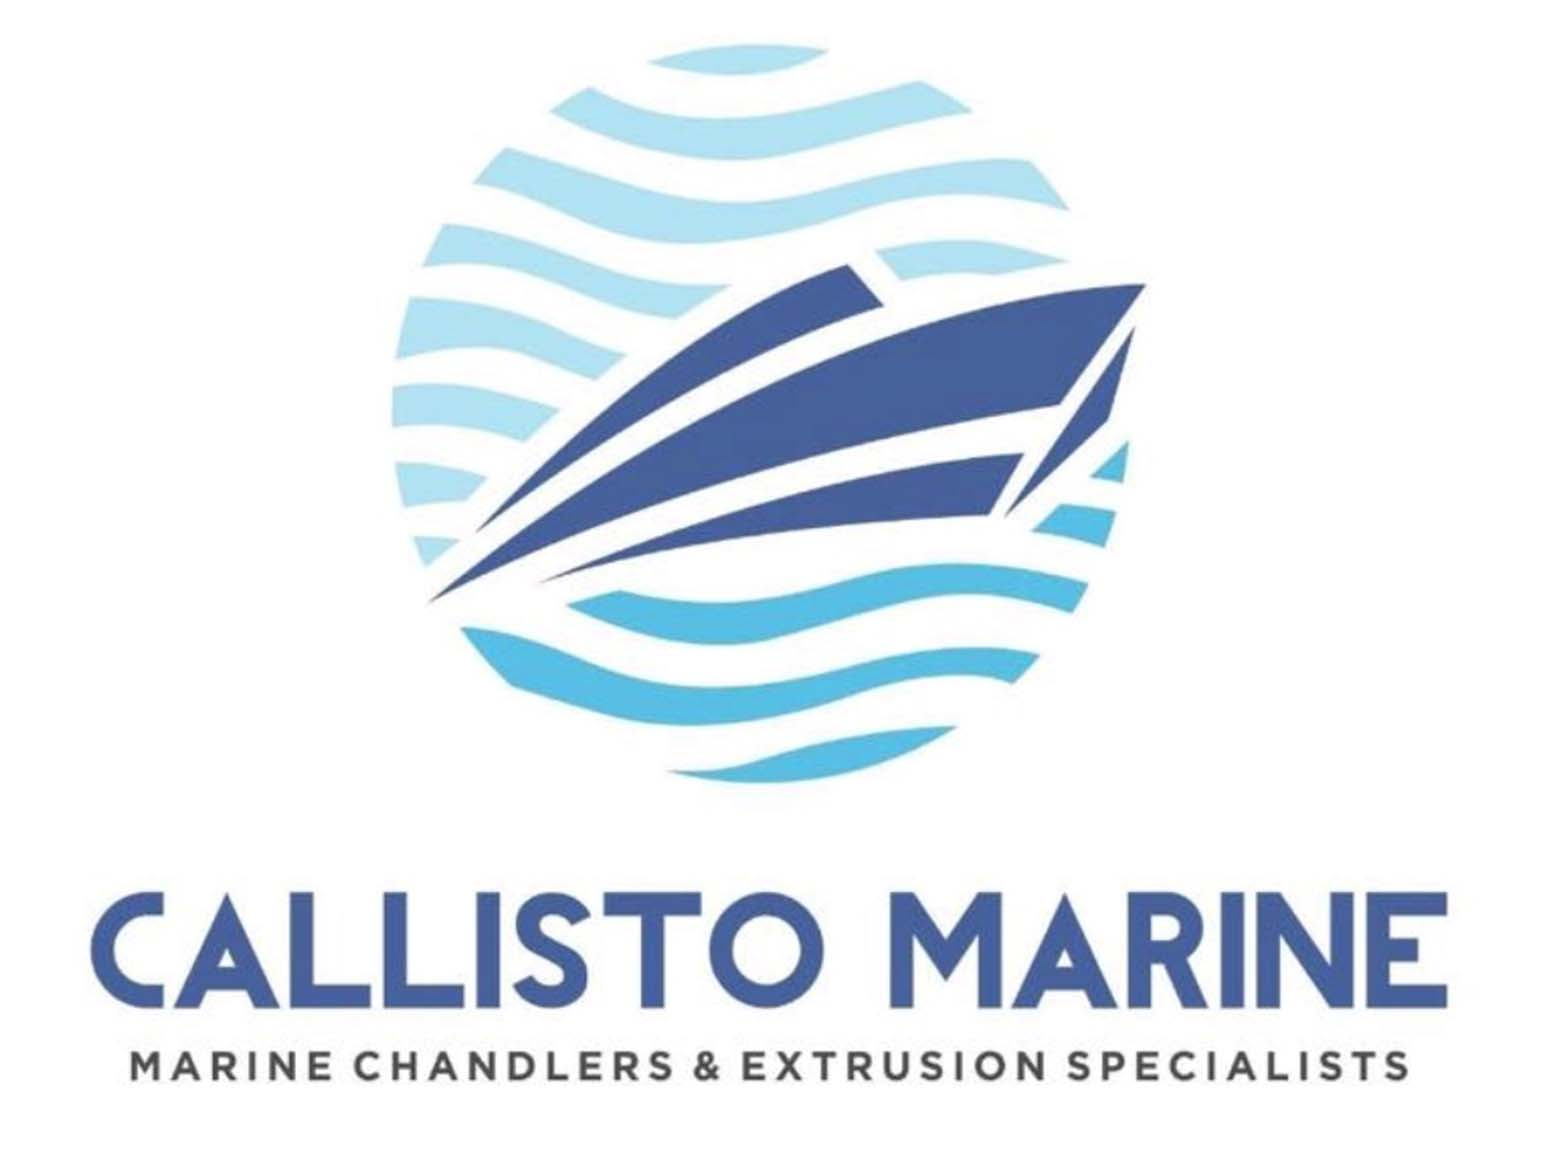 Calisto Marine